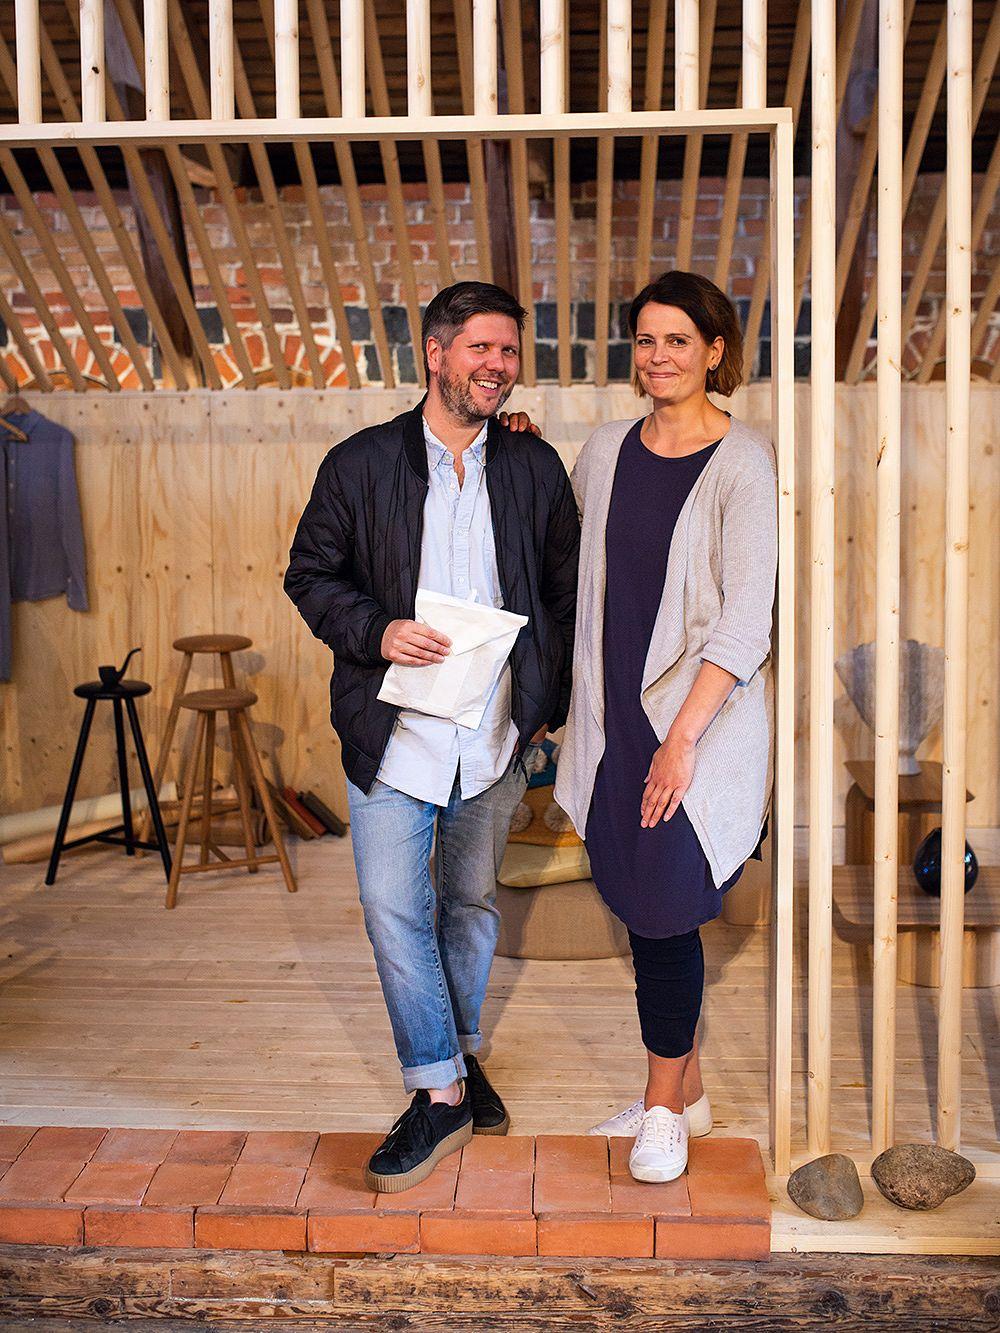 Fiskars Summer House – Samu-Jussi Koski and Jenni Roininen